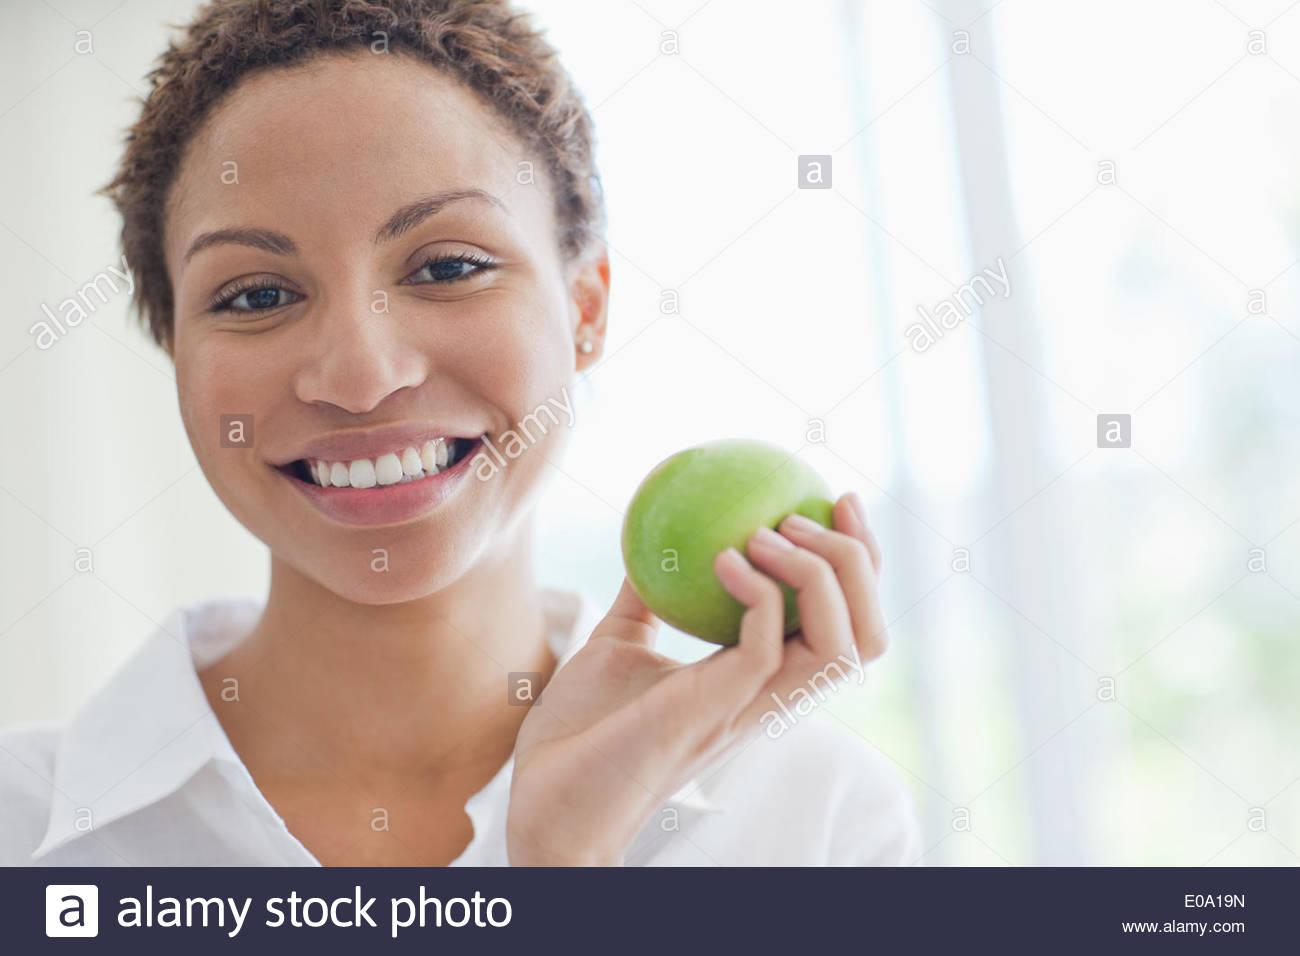 Woman eating green apple - Stock Image